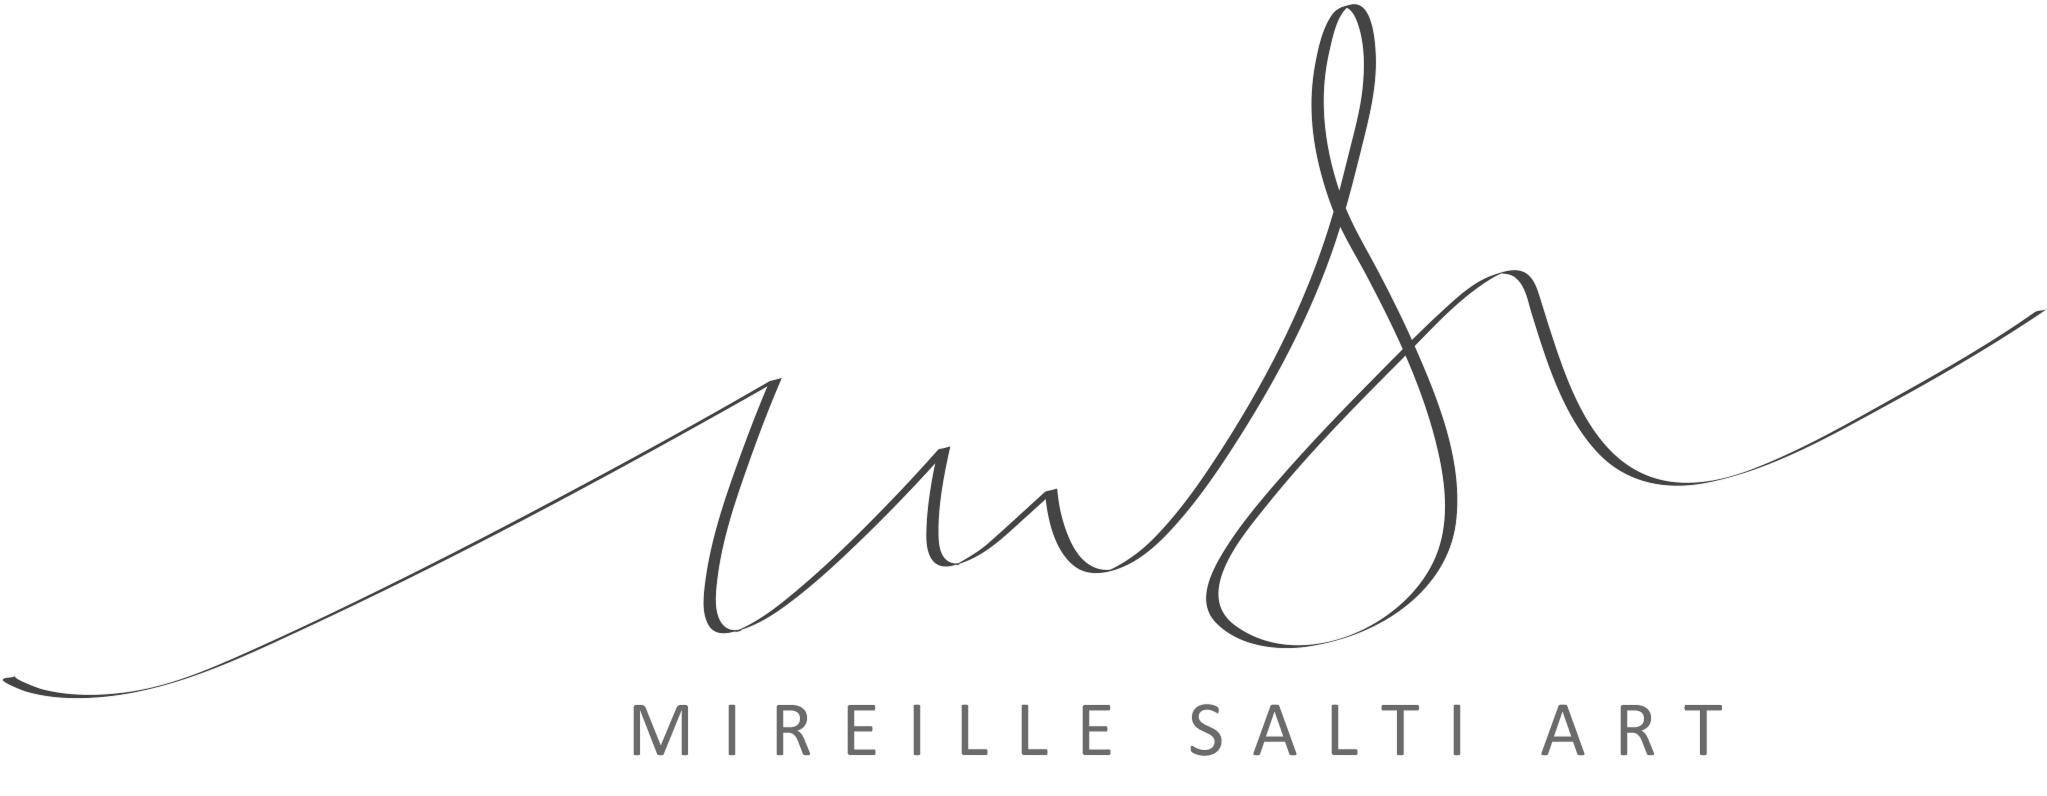 Mireille Salti